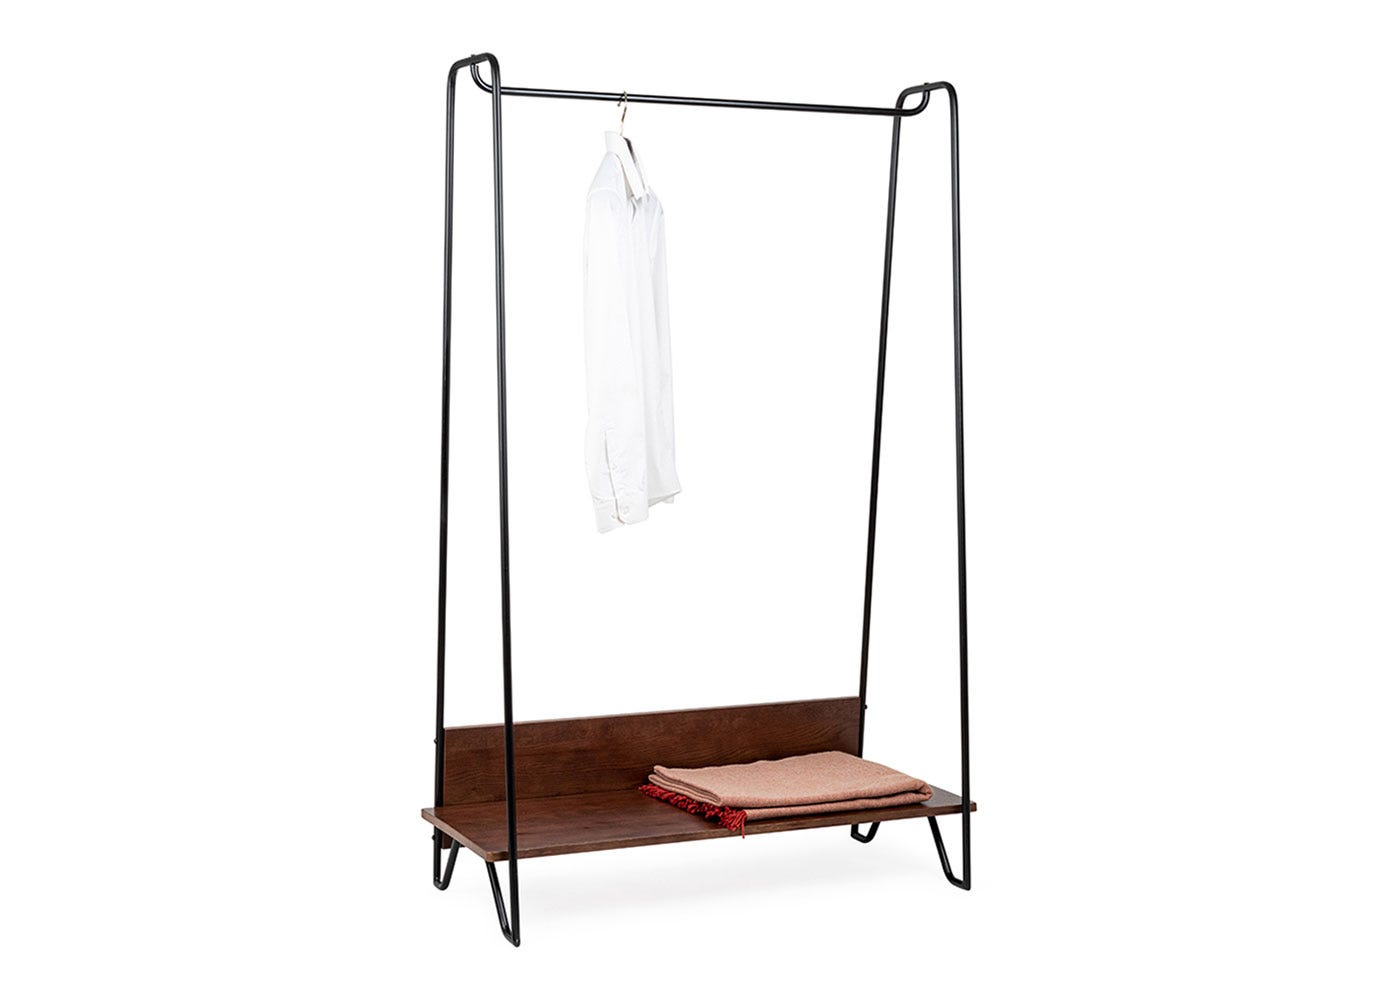 Brunel Hanging Rail Dark Wood Bedroom Furniture Heal S